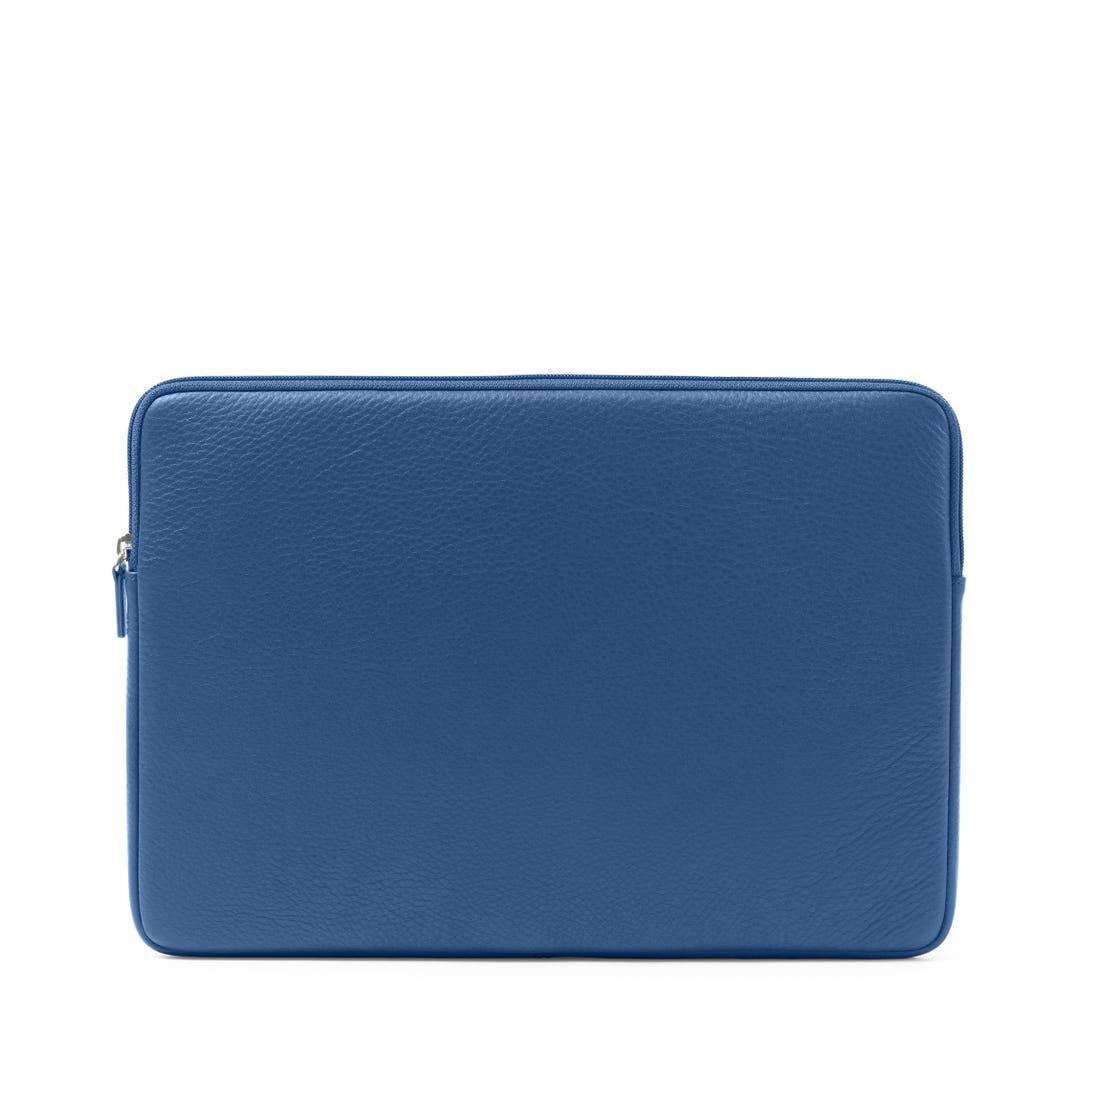 15 Inch MacBook Pro Sleeve